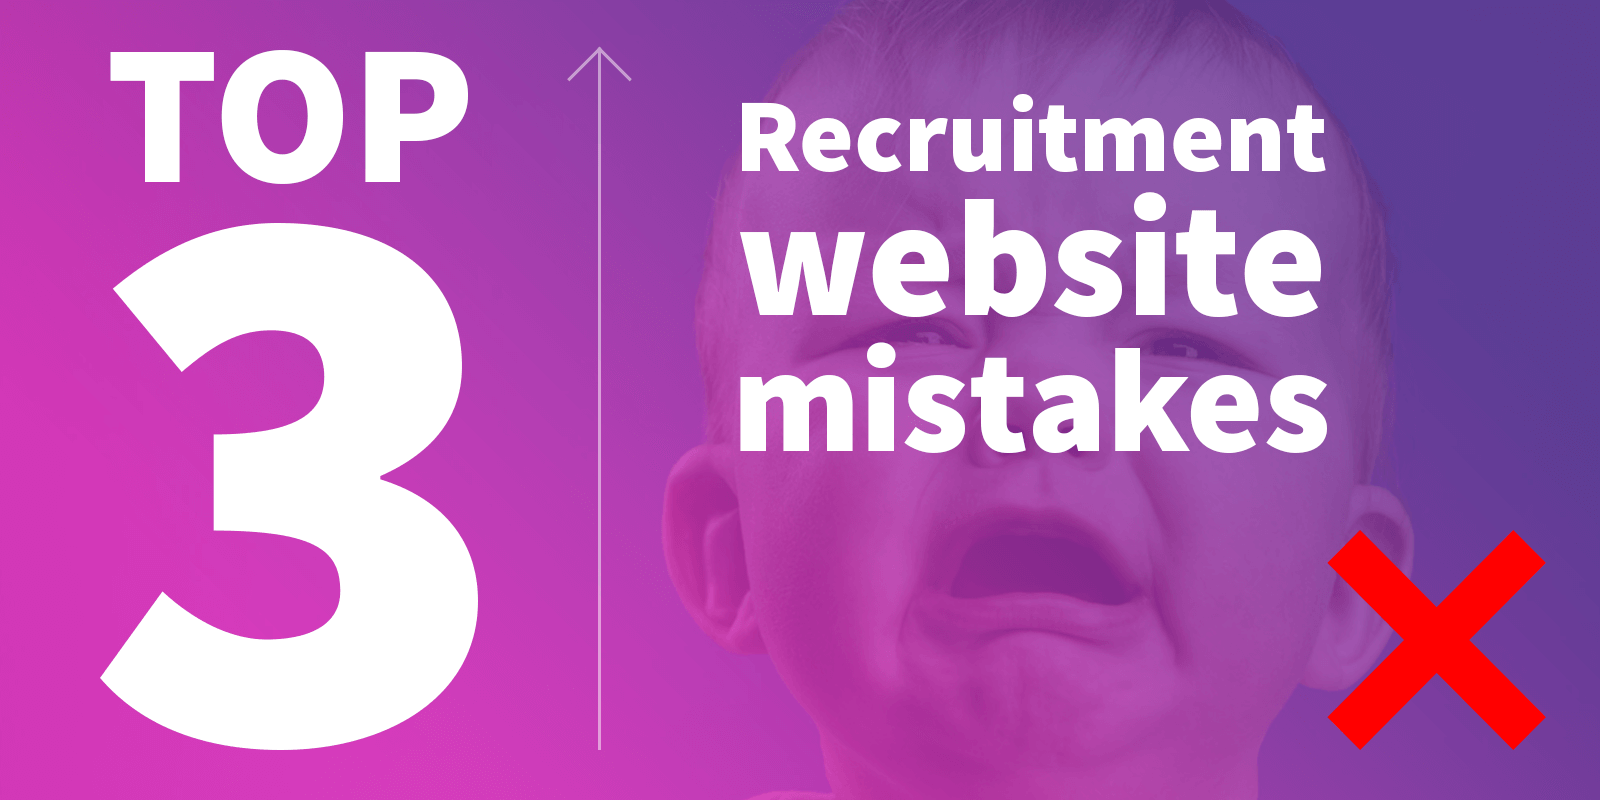 Top 3 Recruitment Website Mistakes